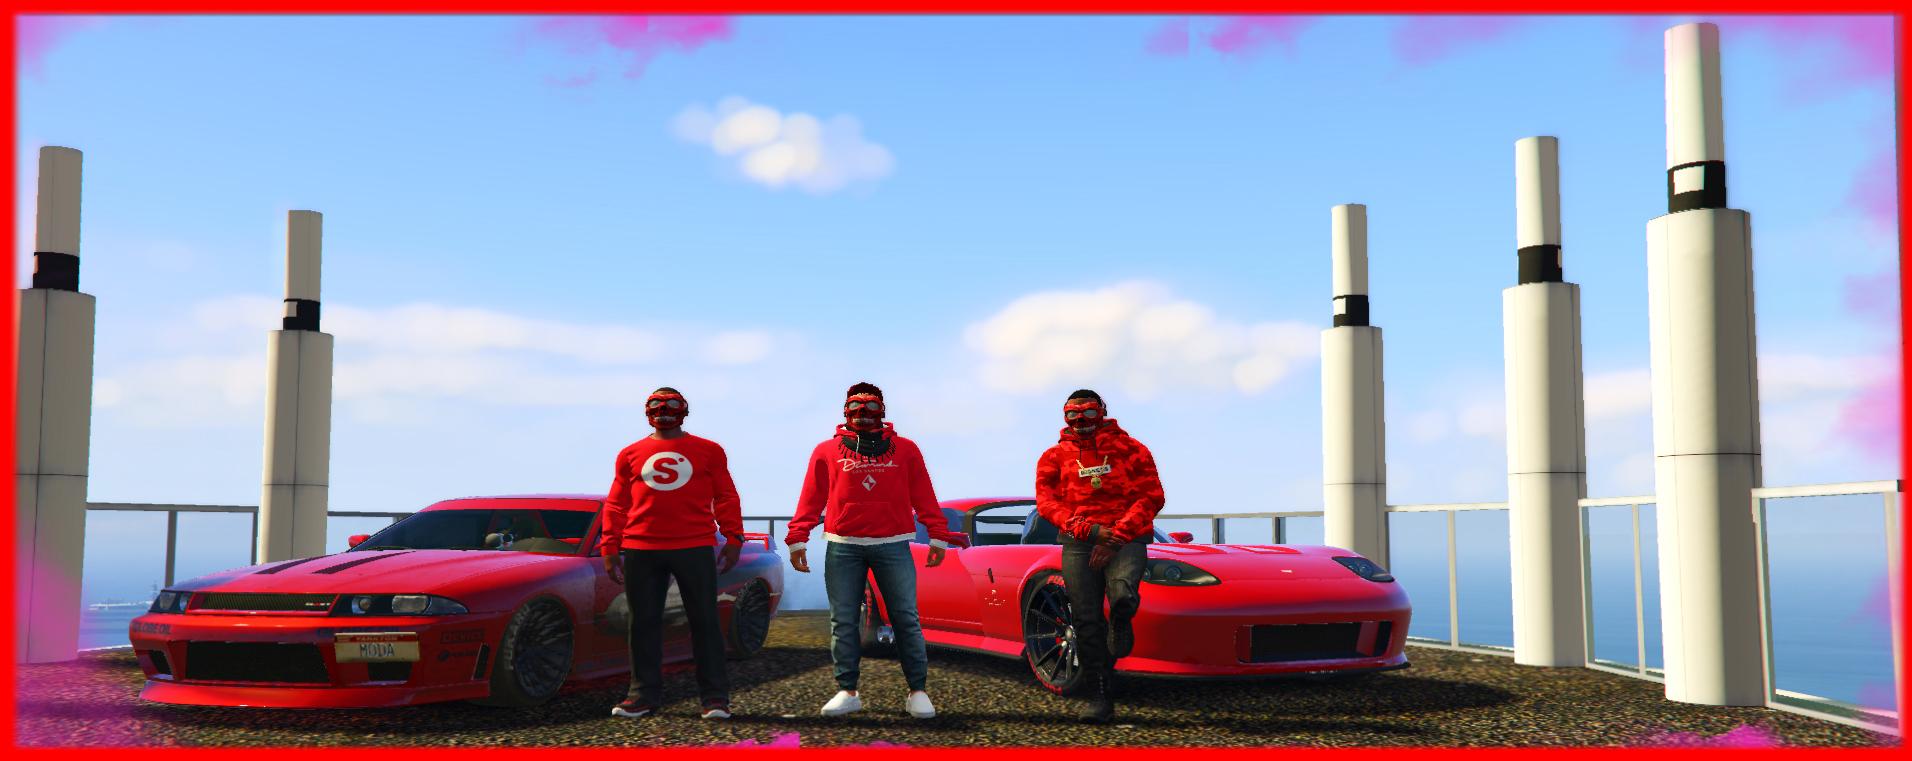 Grand_Theft_Auto_V_Screenshot_2021.02.jpg